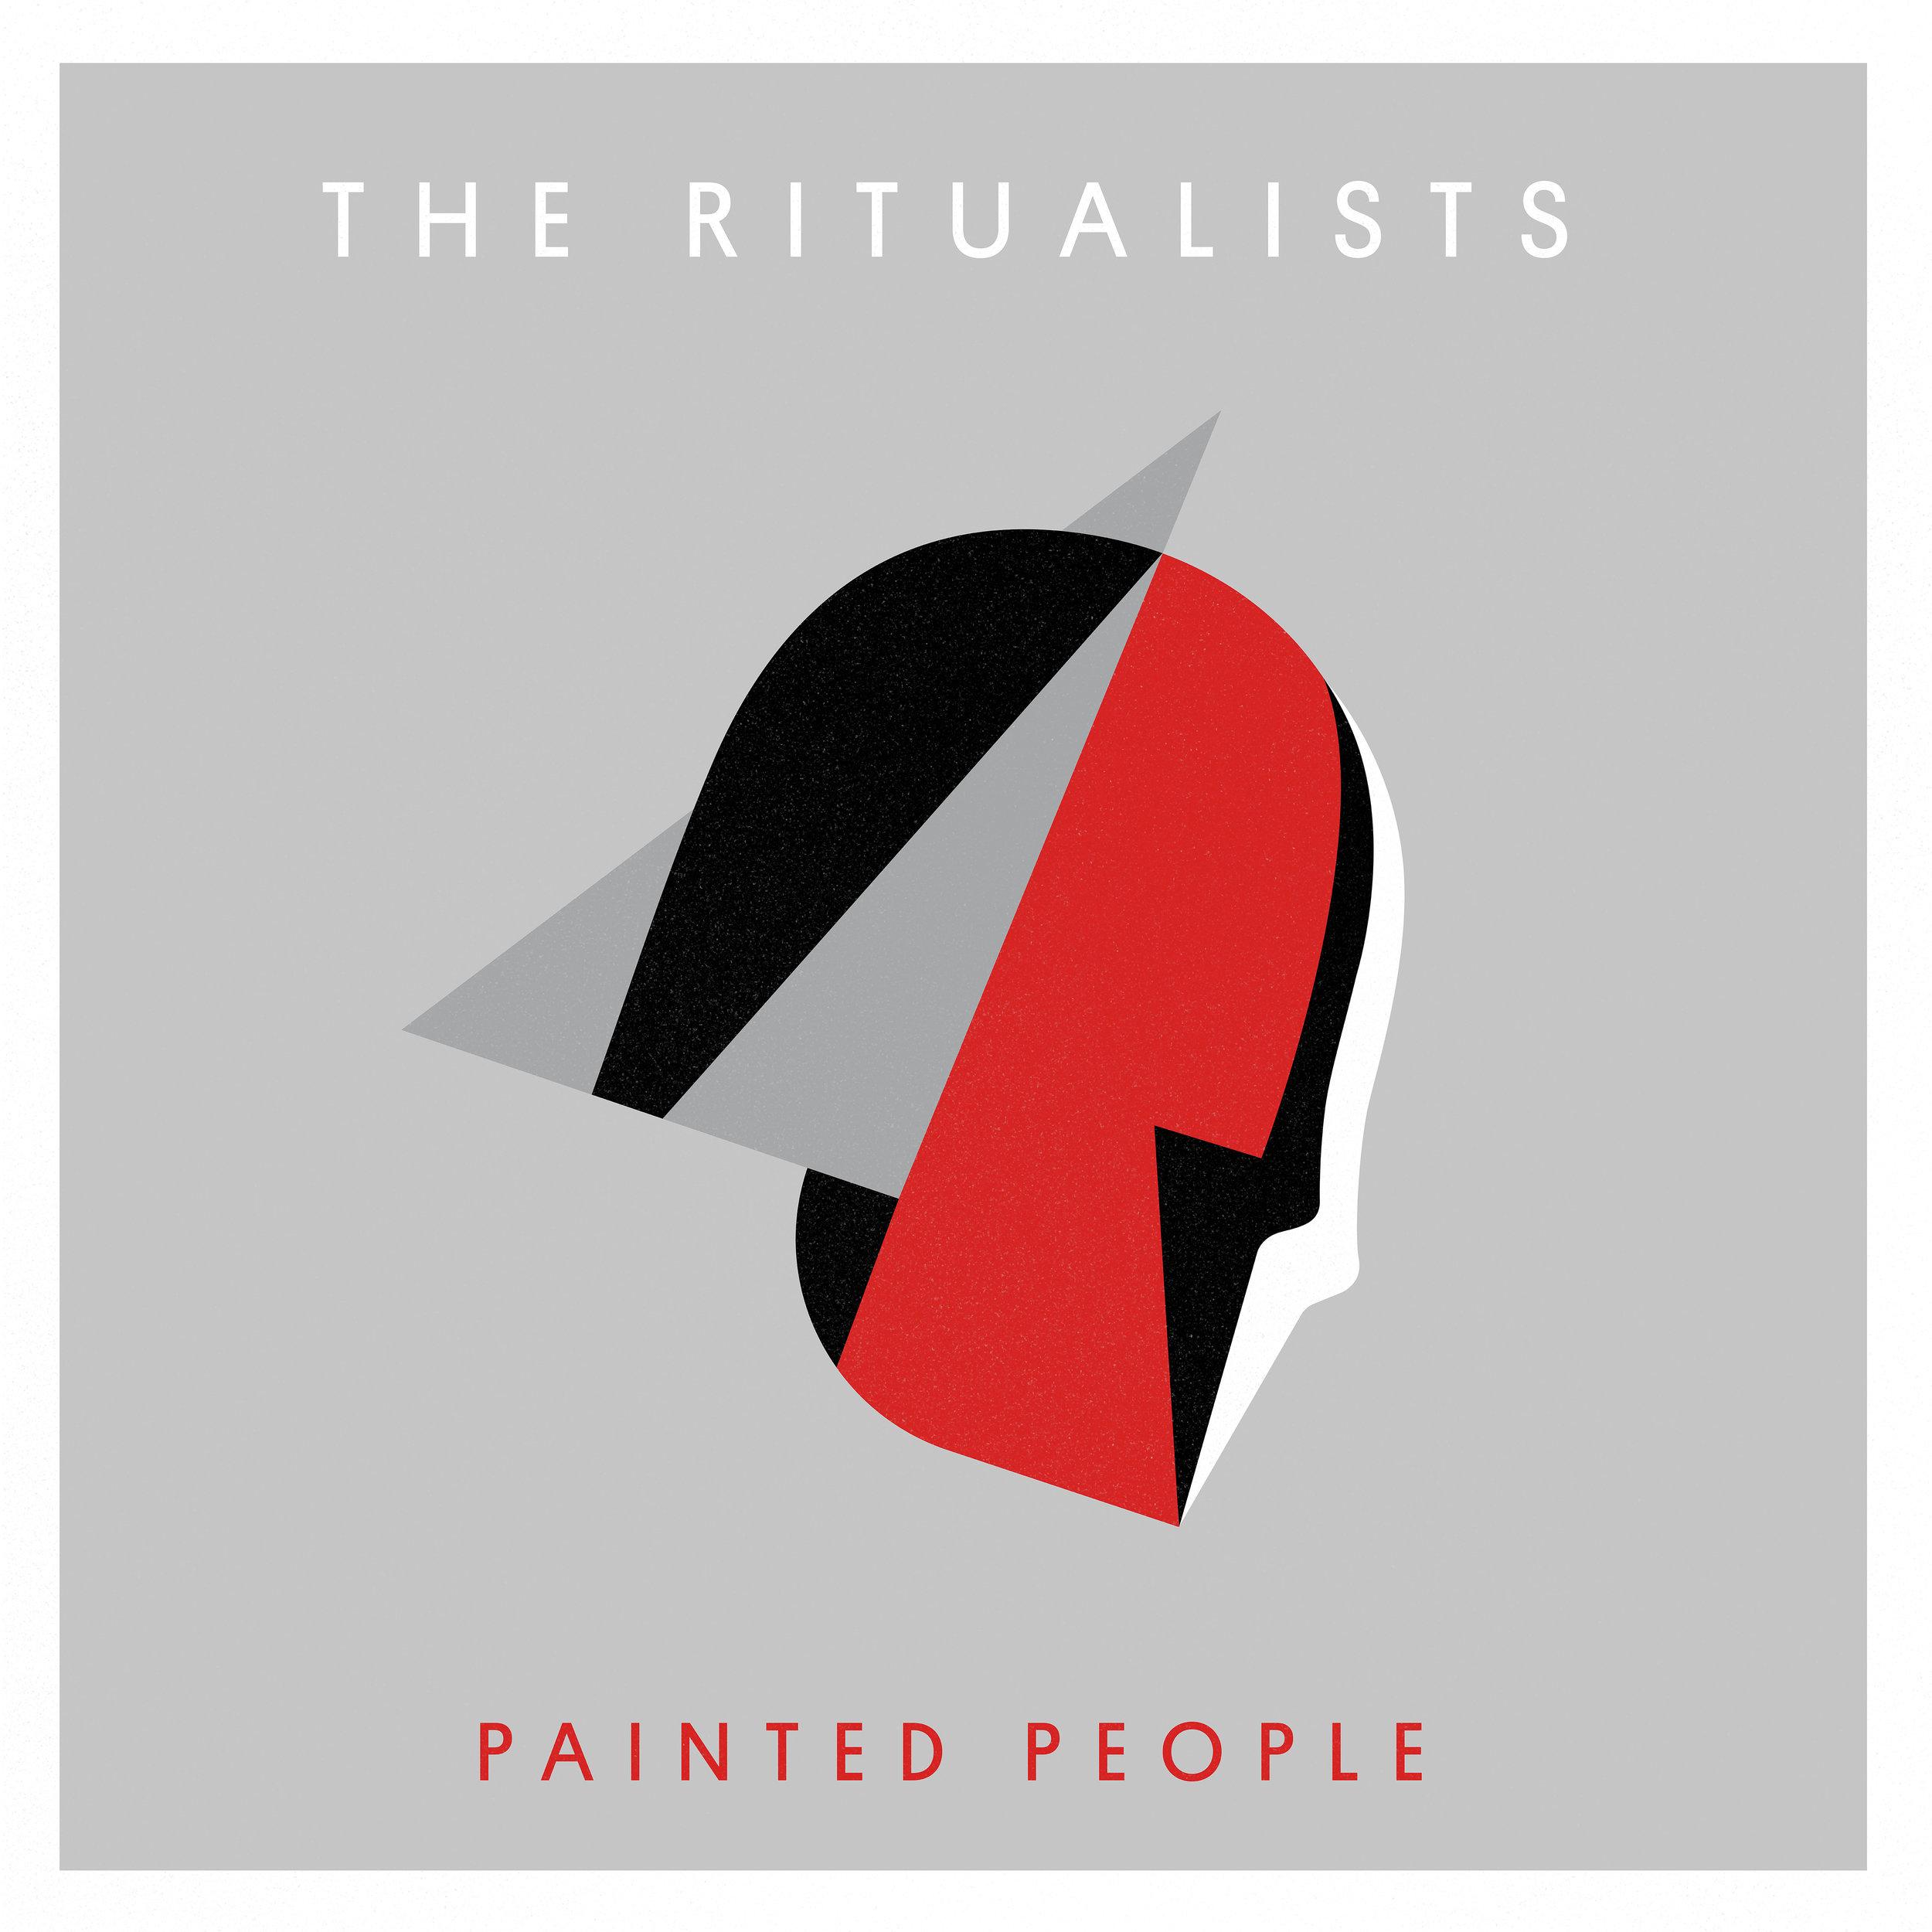 Ritualists_AlbumCover-01.jpg